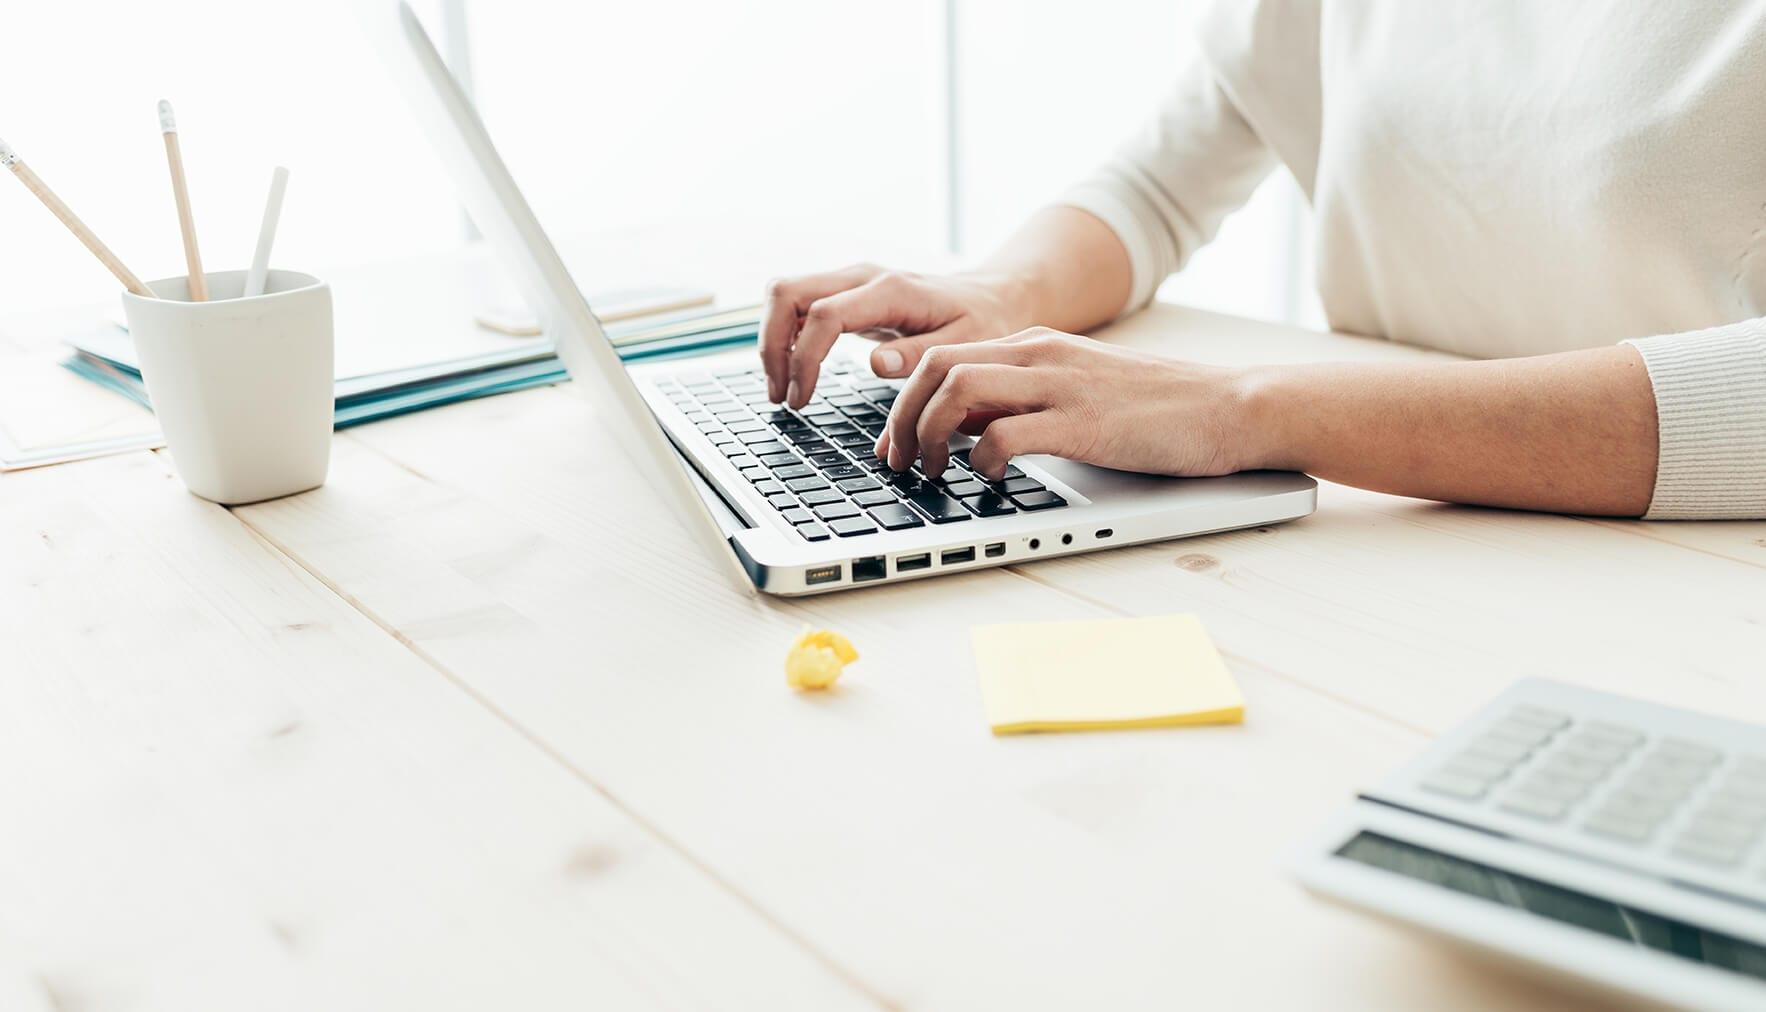 brand strategy blog writing woman